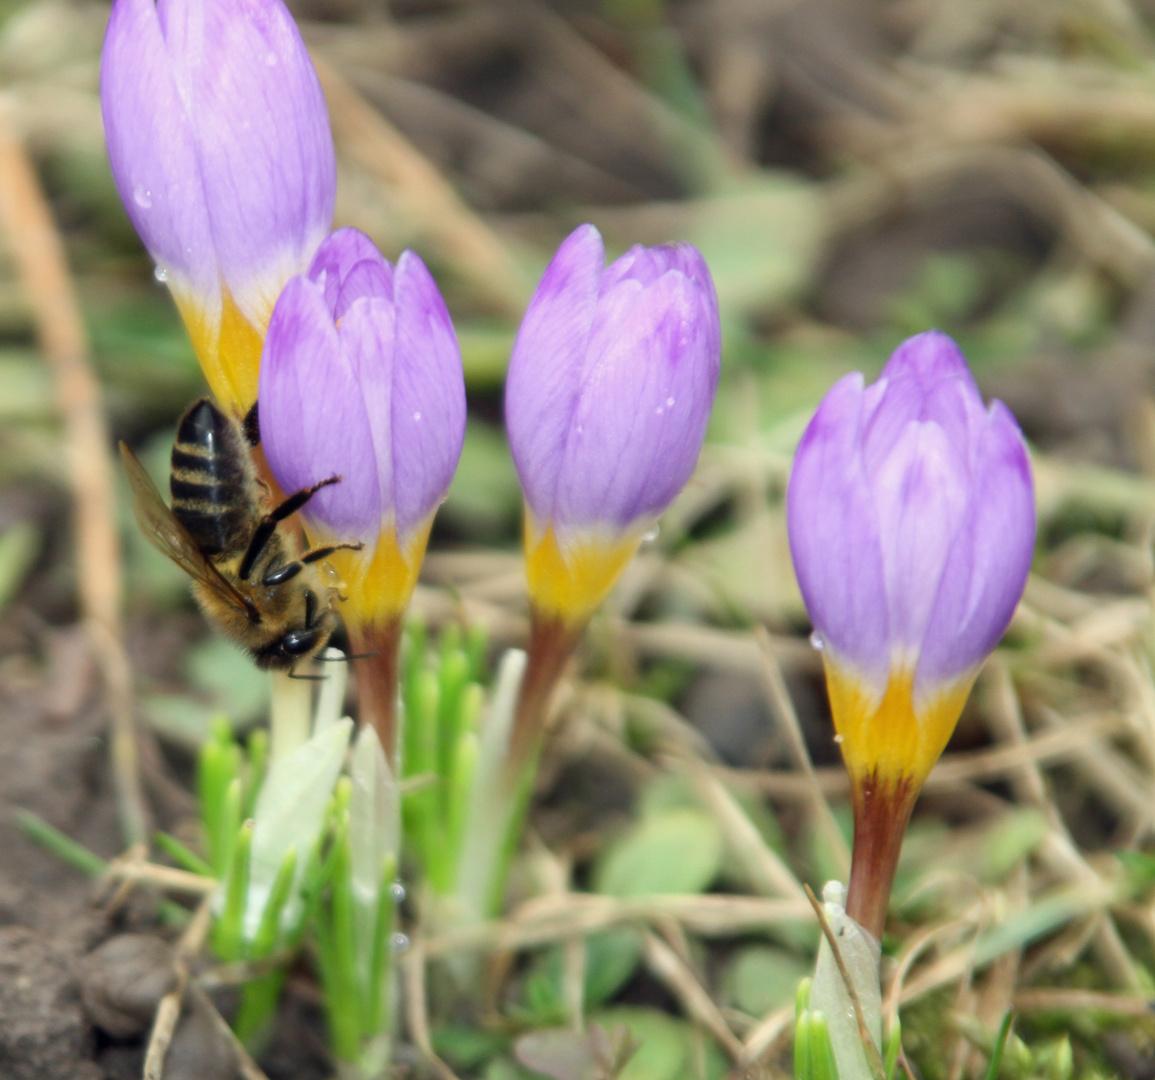 Der Frühling kämpft